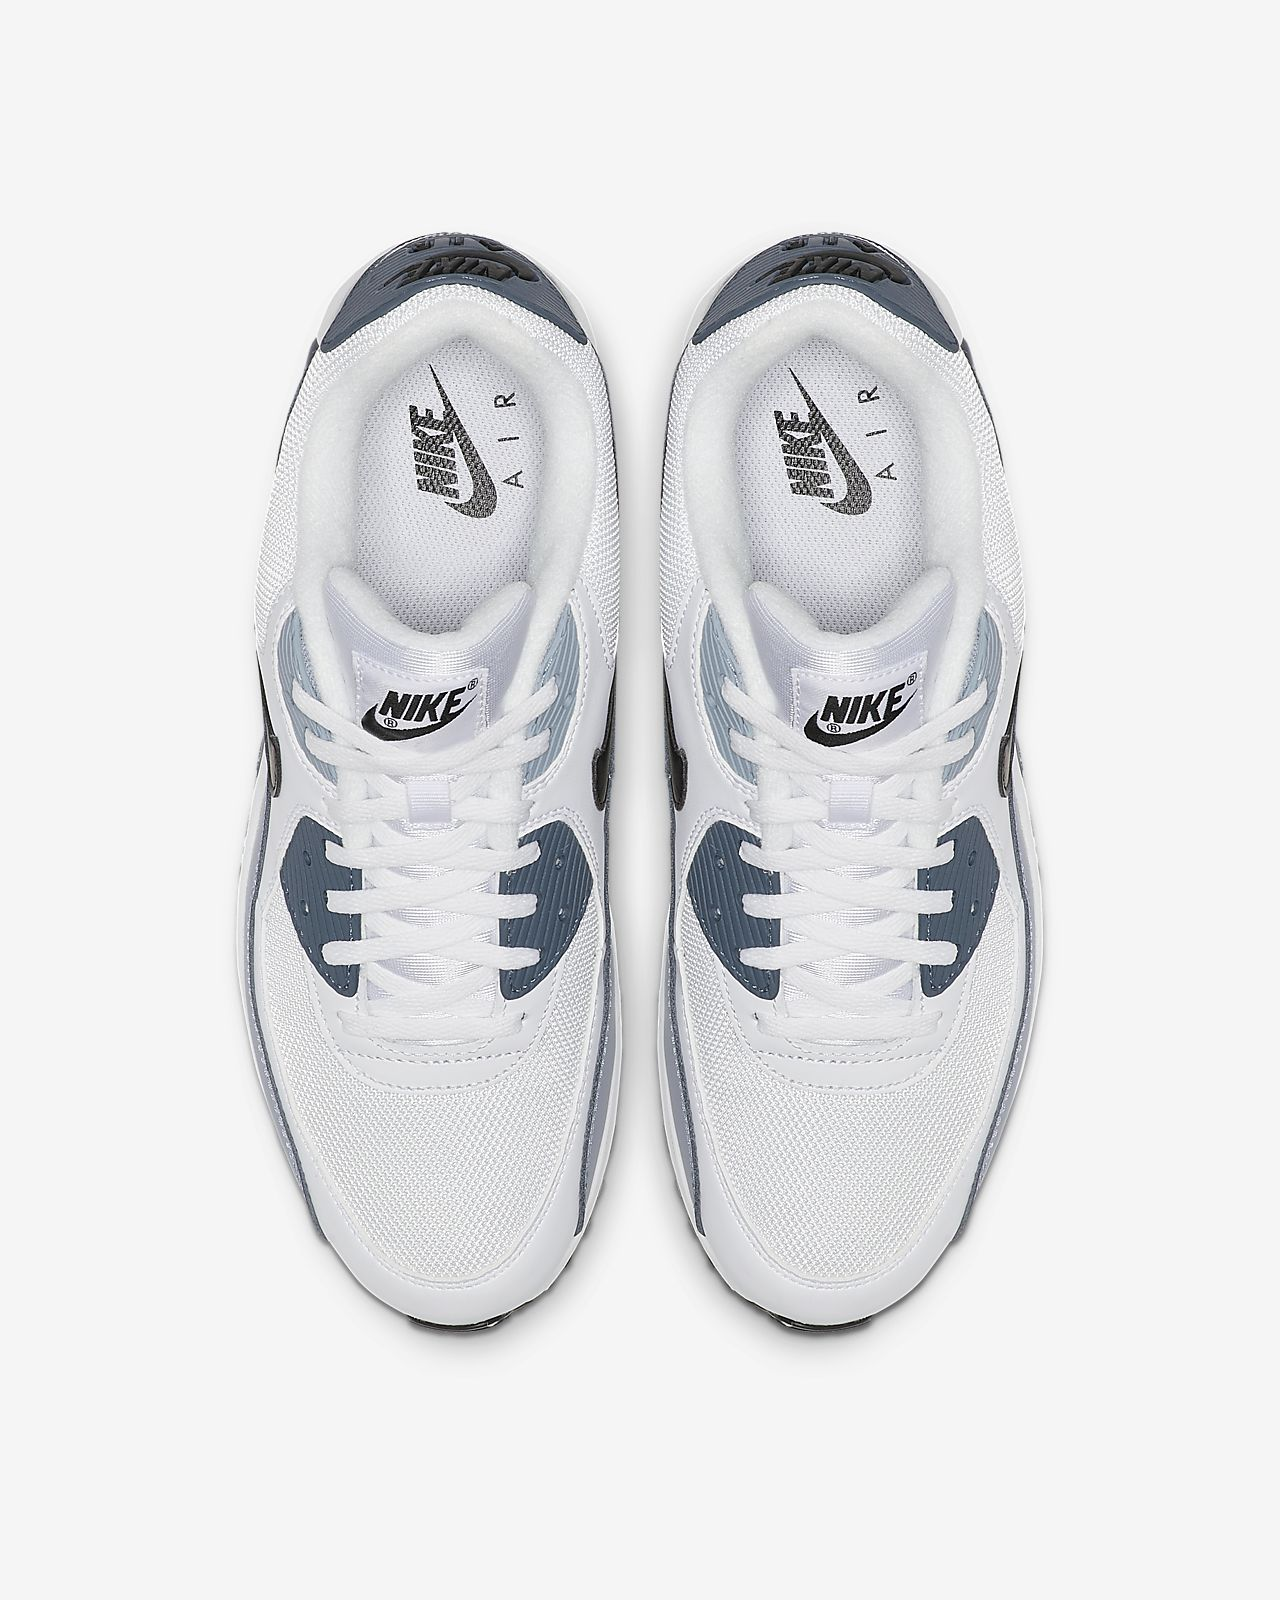 save off 623d4 09be5 ... Skon Nike Air Max 90 Essential för män